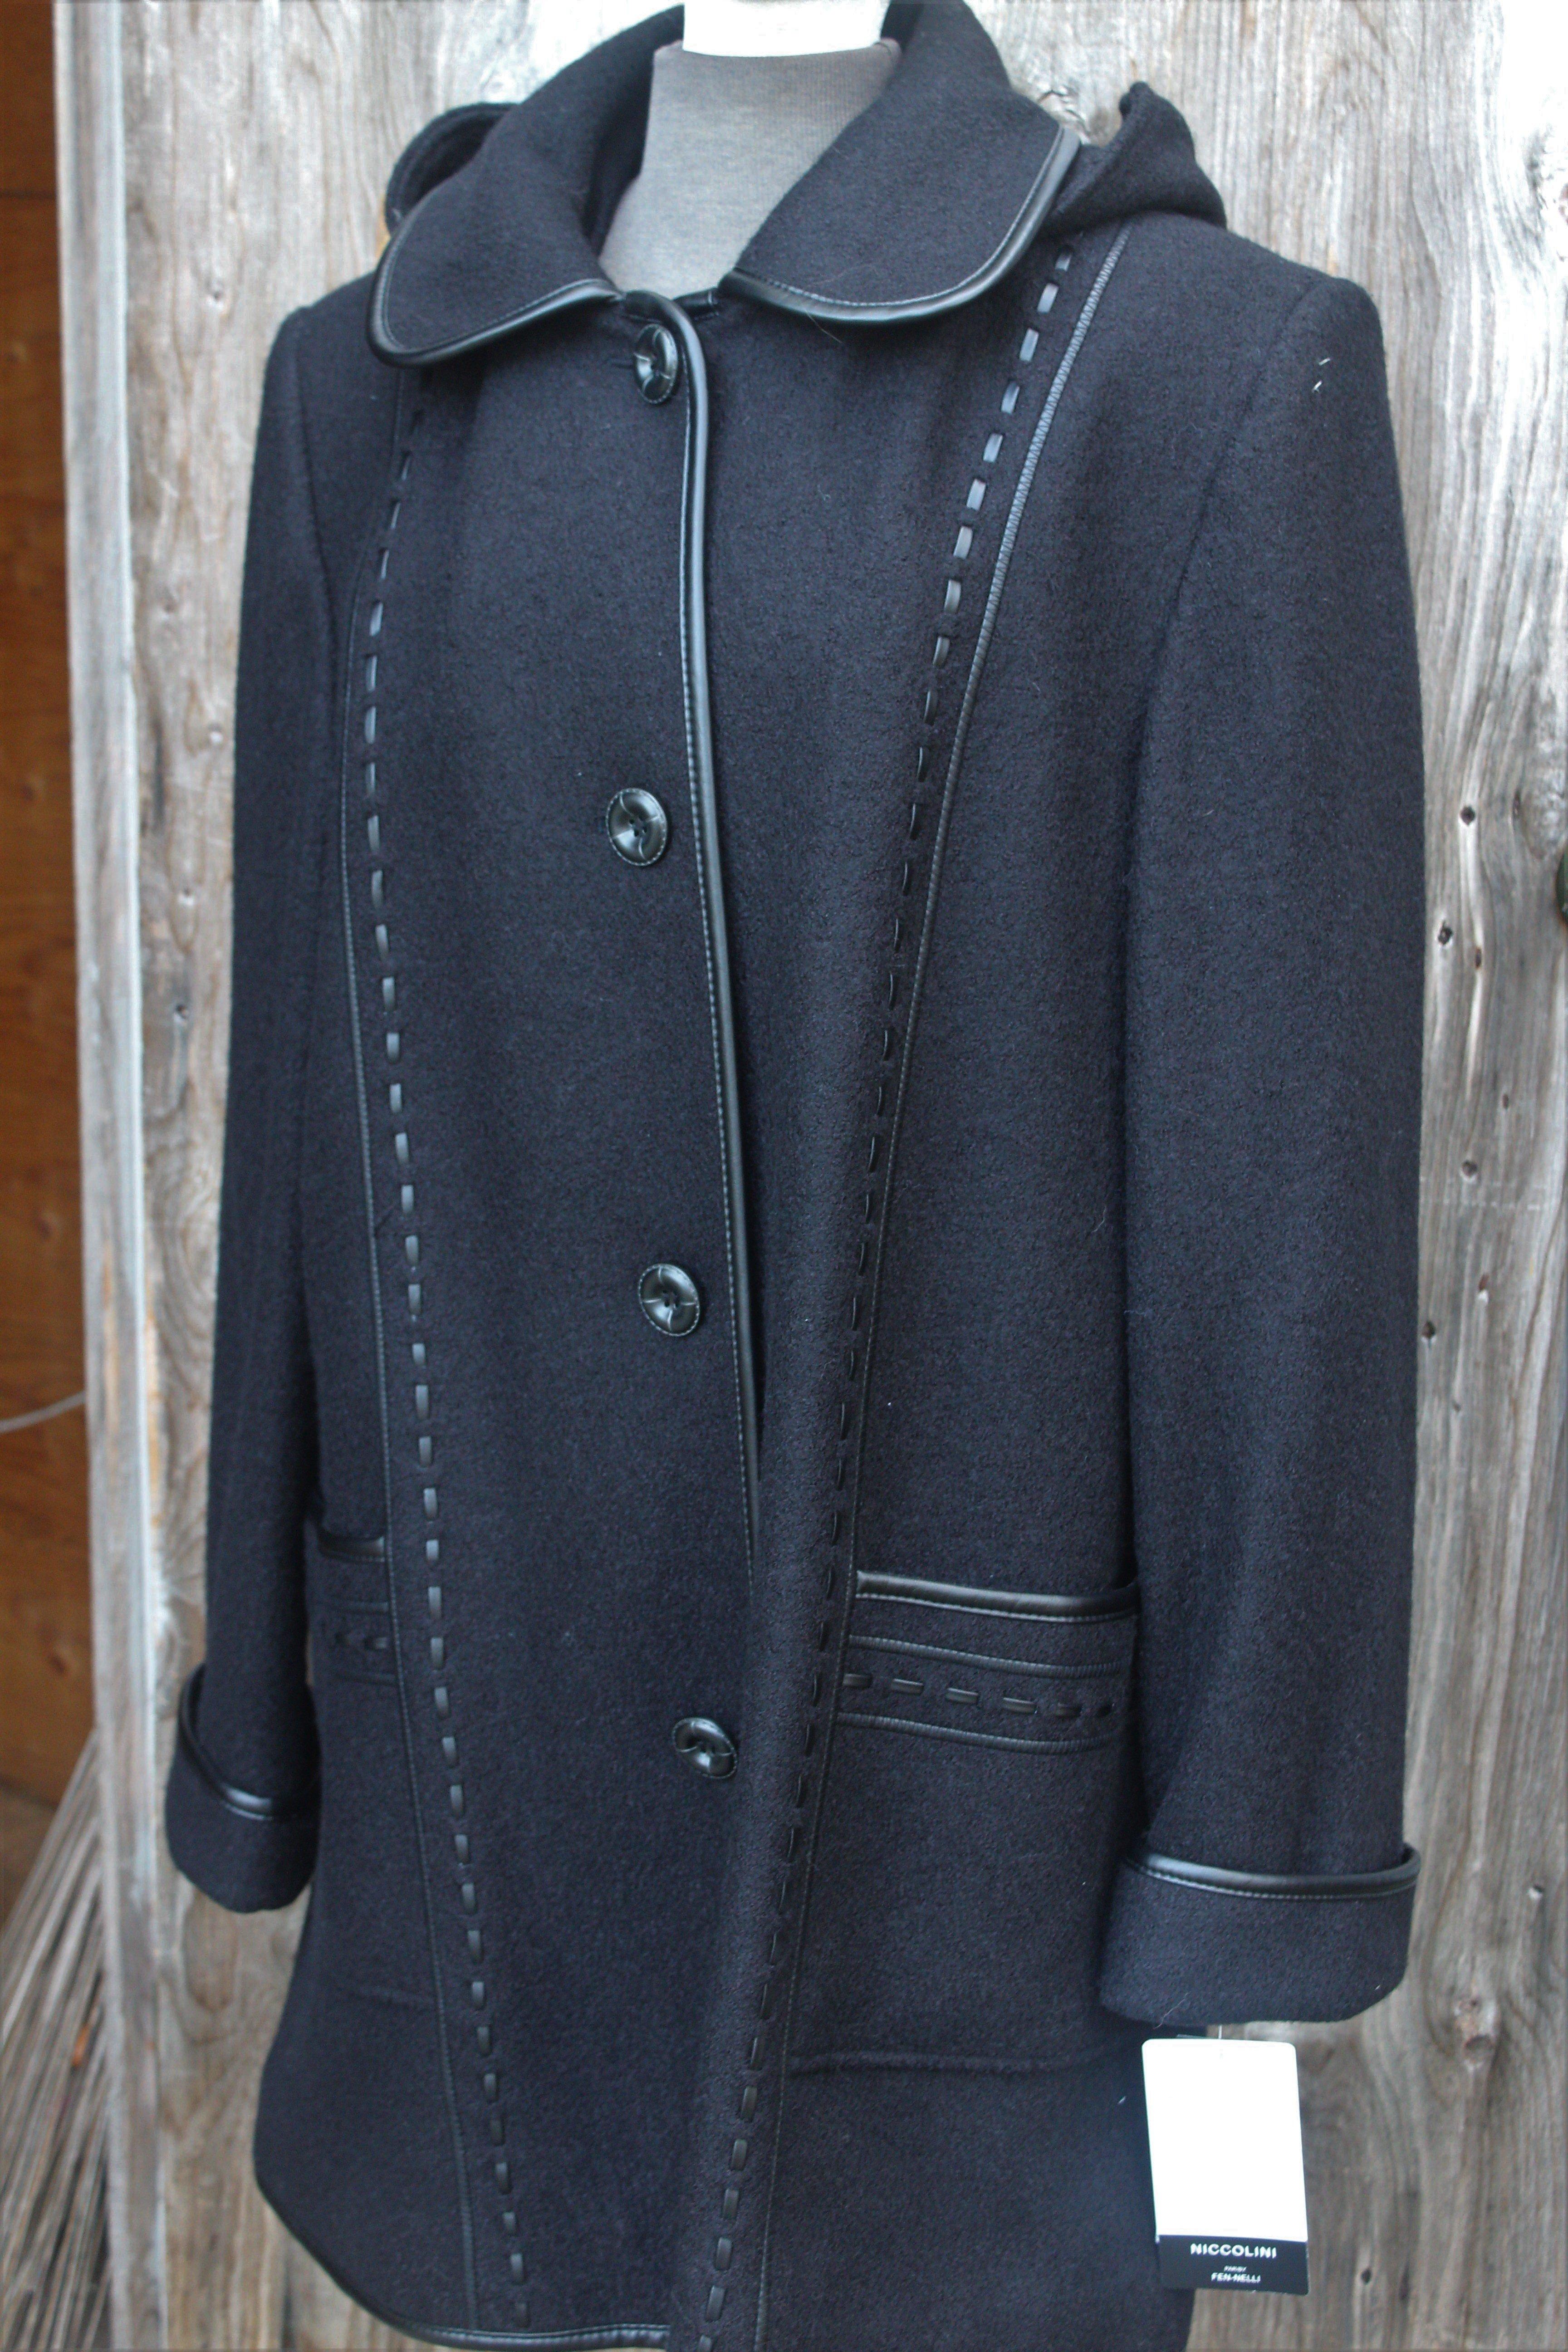 Wool- $240.00 Niccolini: Style #D1779P